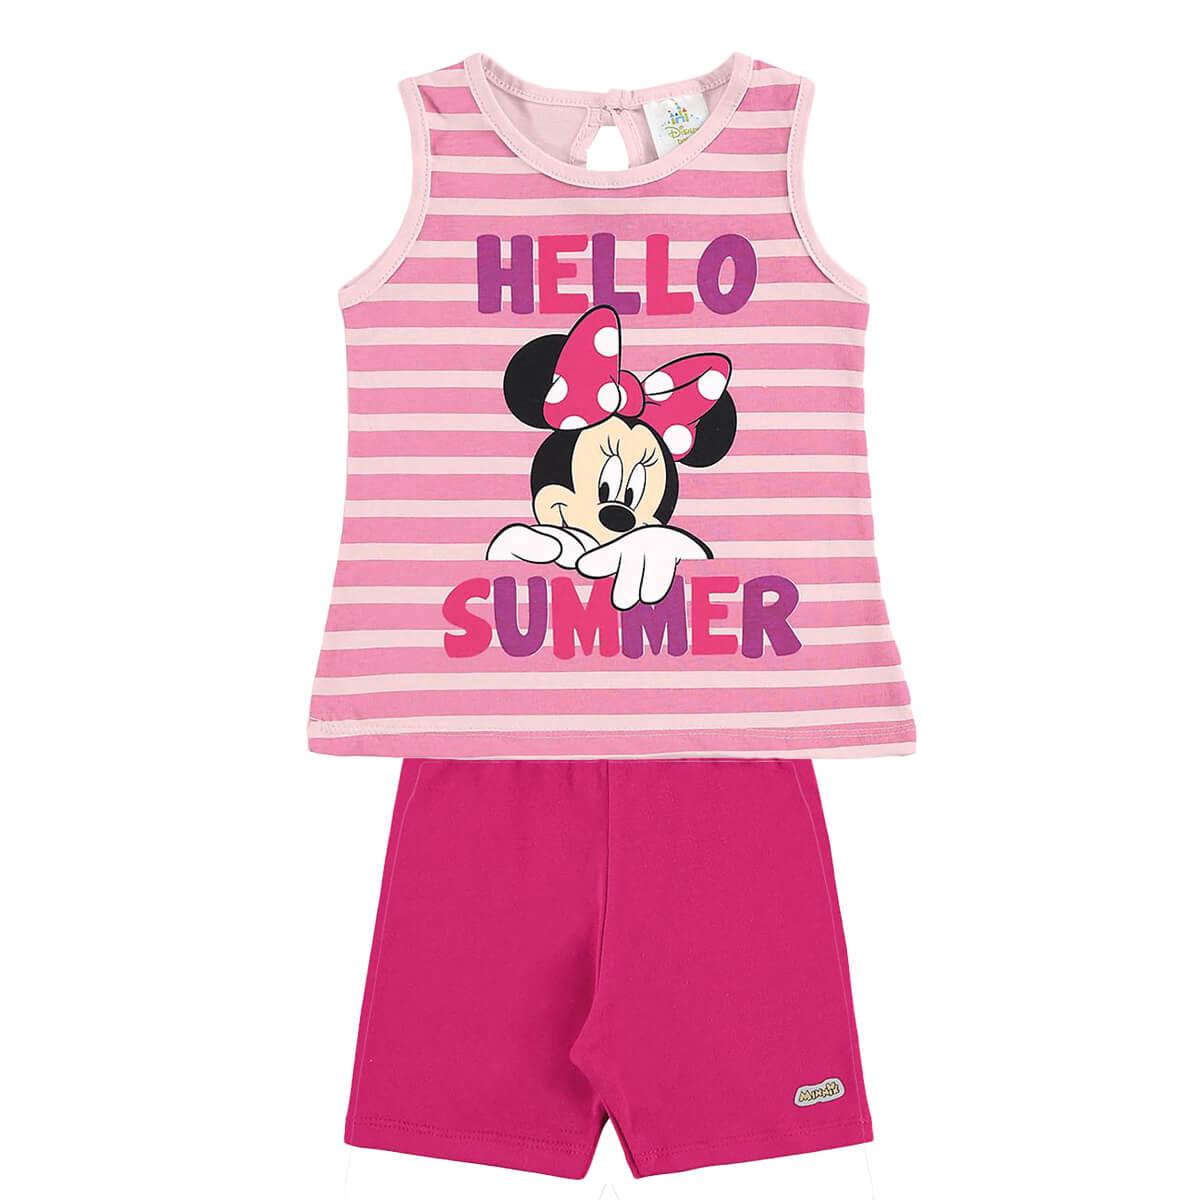 Conjunto Bebê Menina Regata Minnie Hello Summer